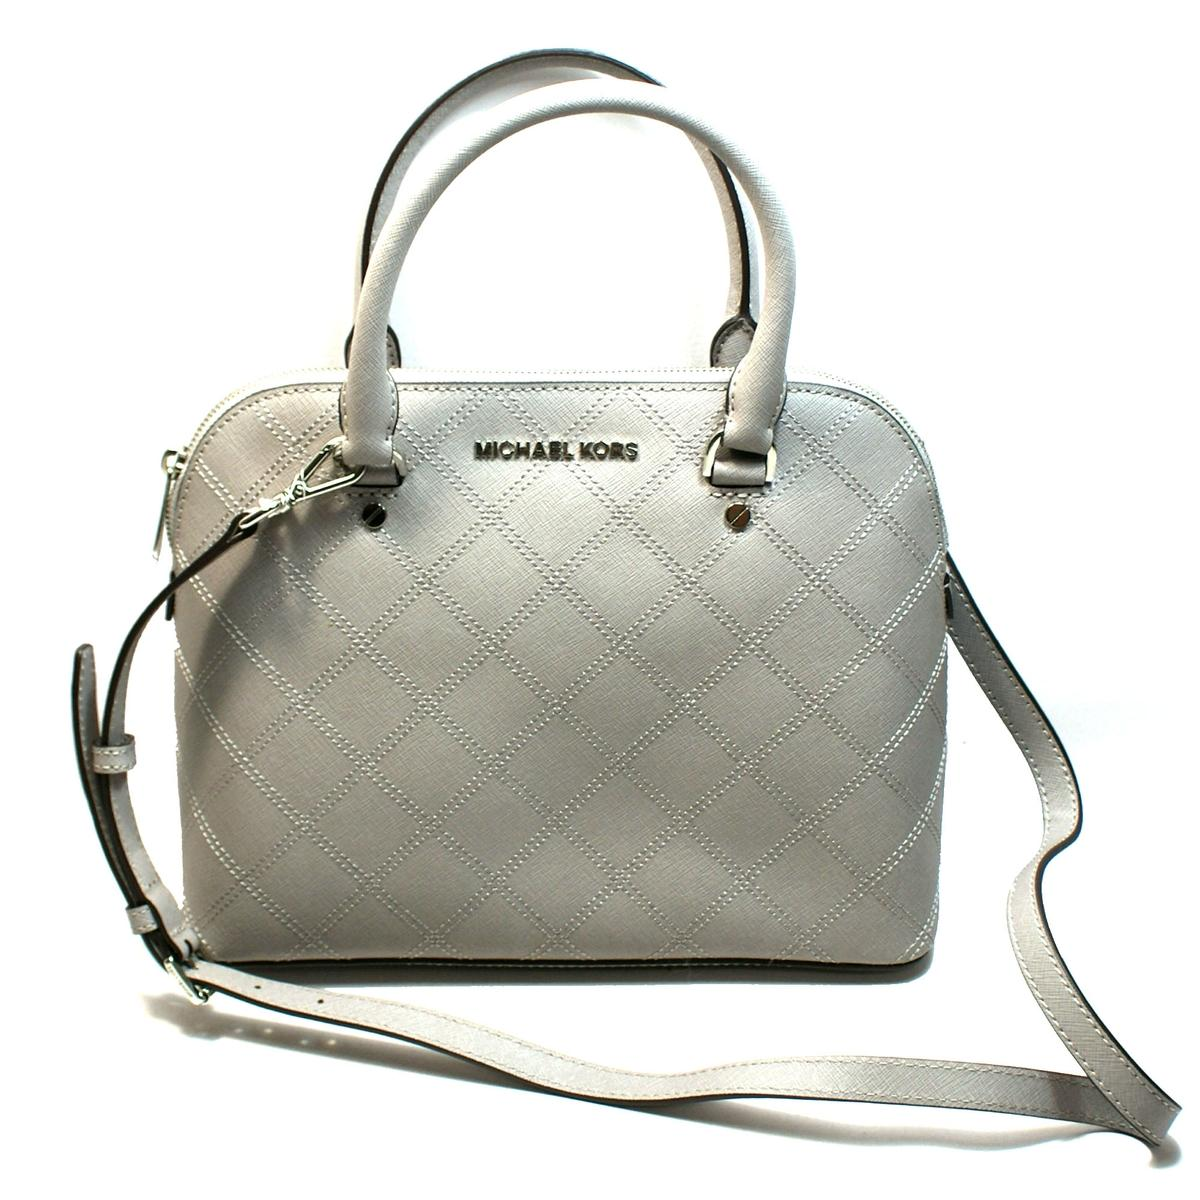 Home Michael Kors Cindy Medium Dome Leather Satchel Crossbody Bag Pearl Grey